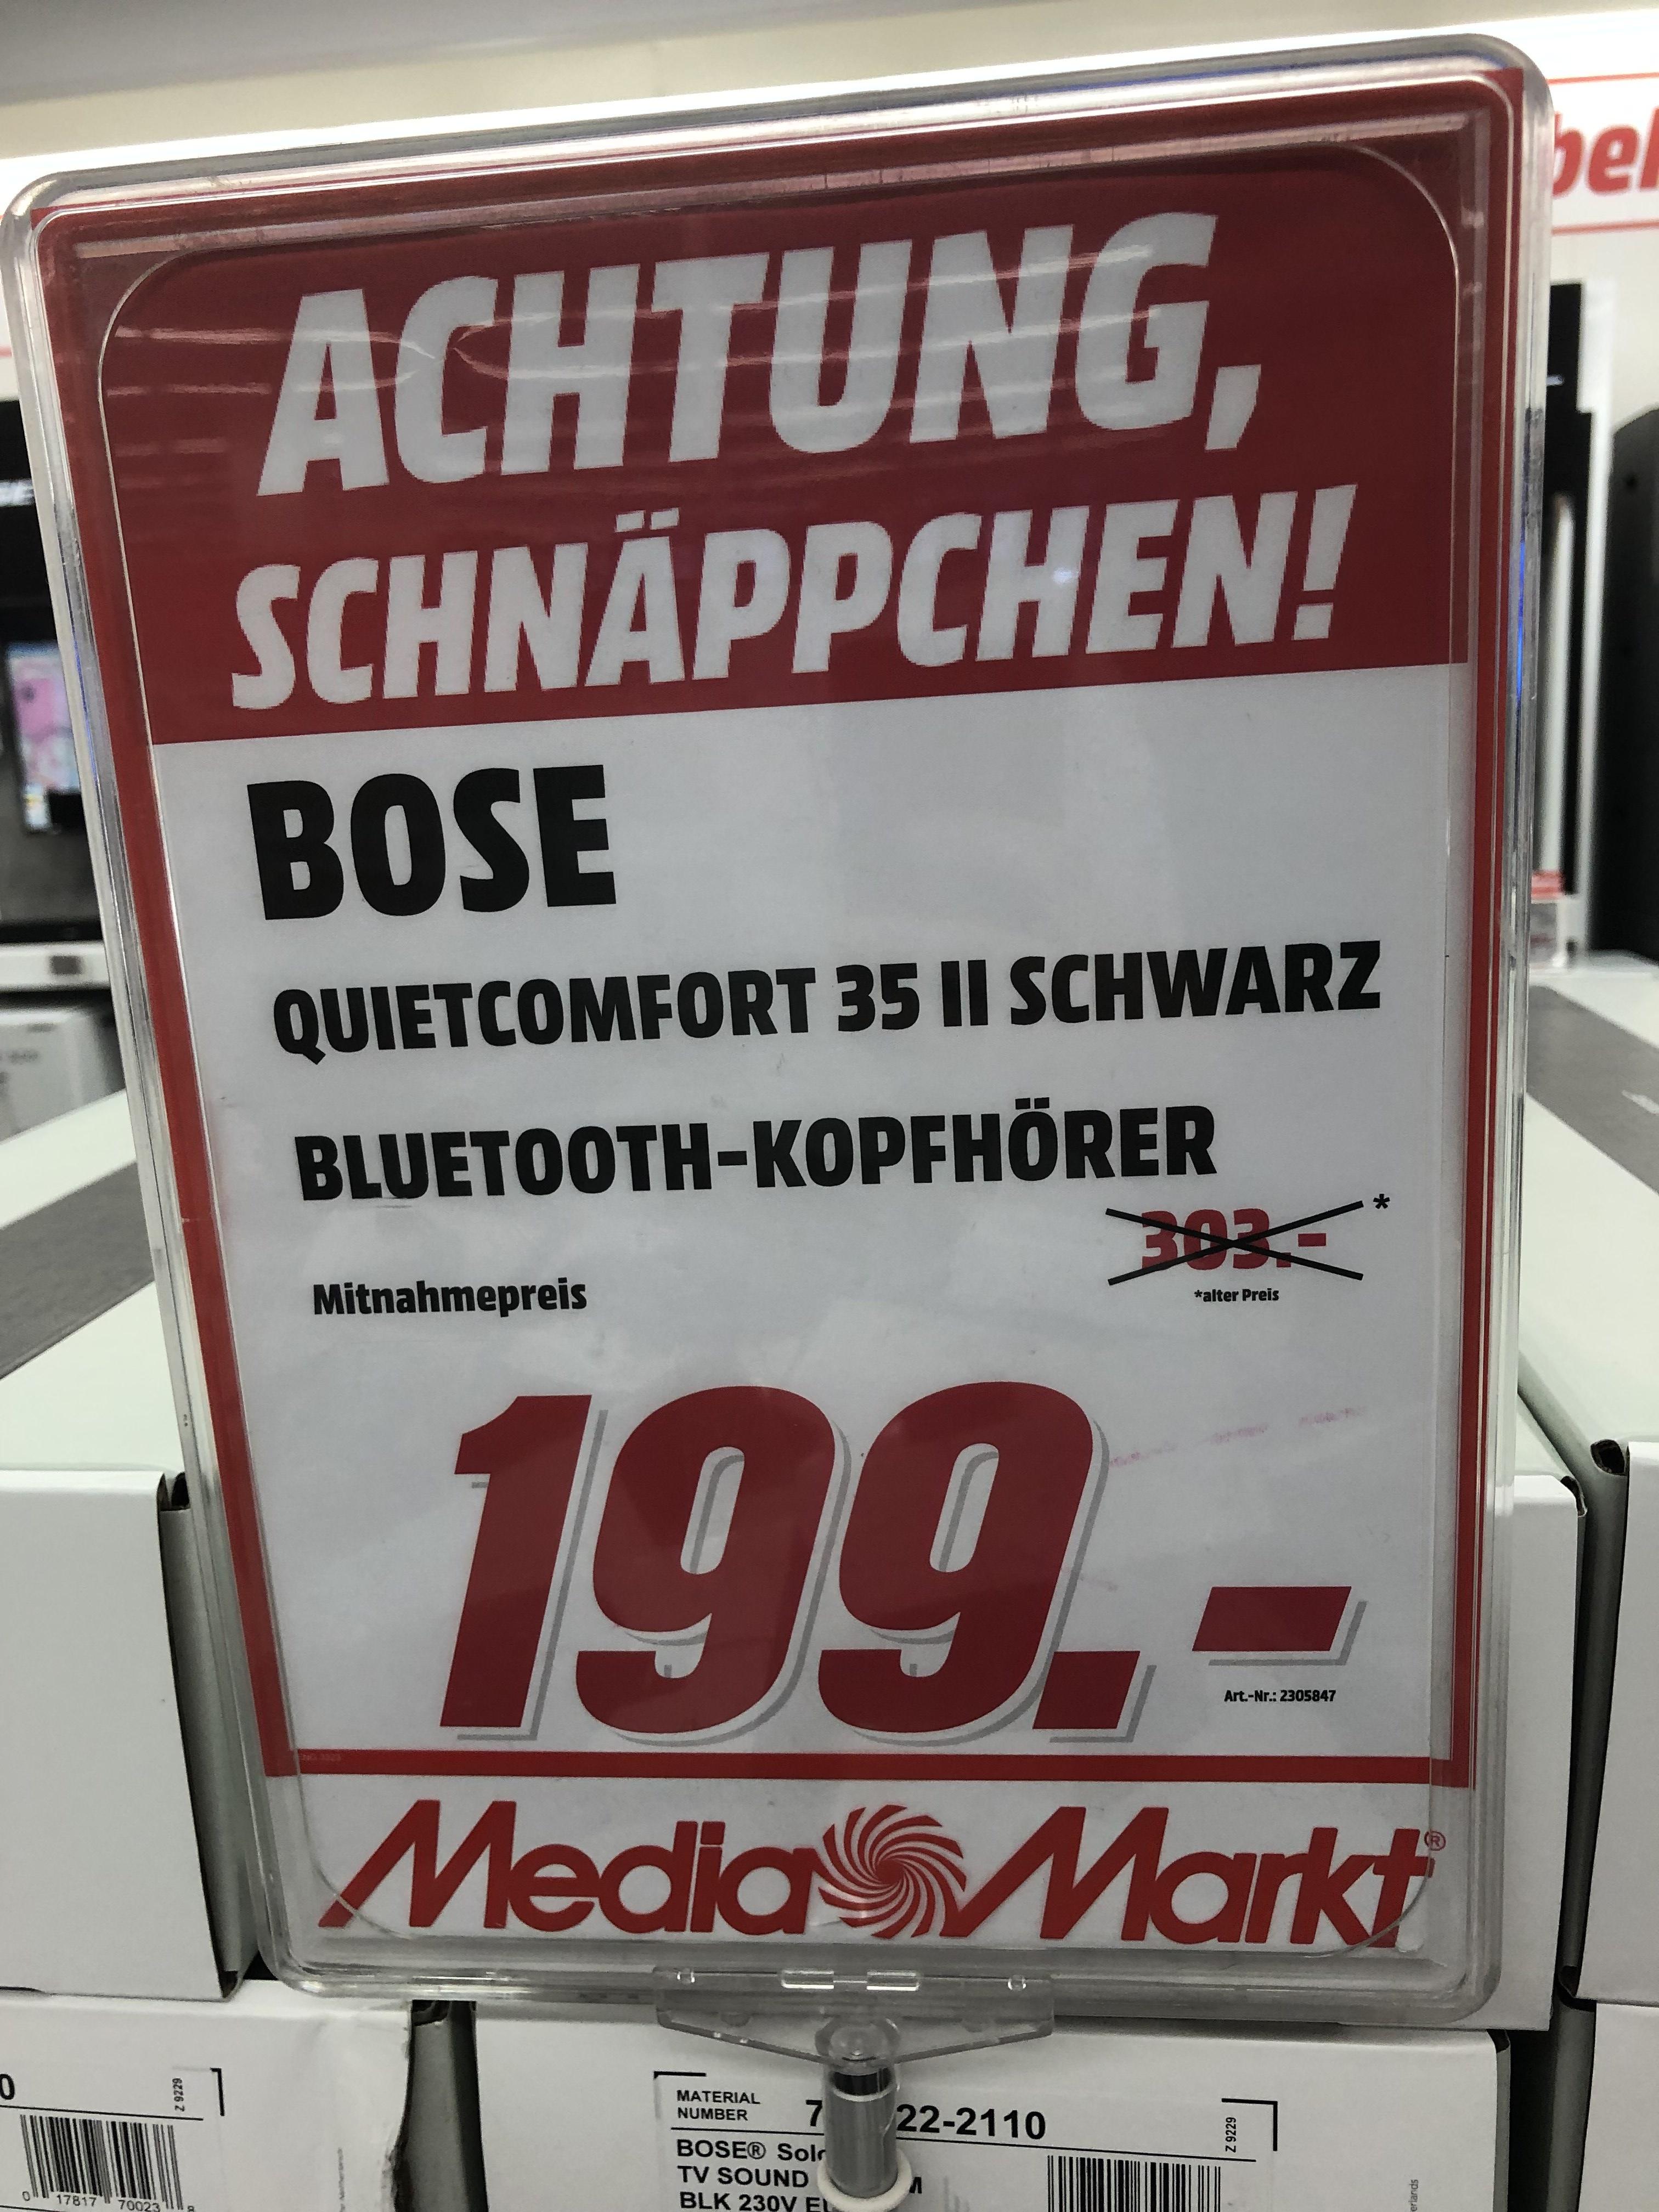 Lokal MediaMarkt Frankfurt MTZ: Bose Quietcomfort 35 II Schwarz Bluetooth Kopfhörer